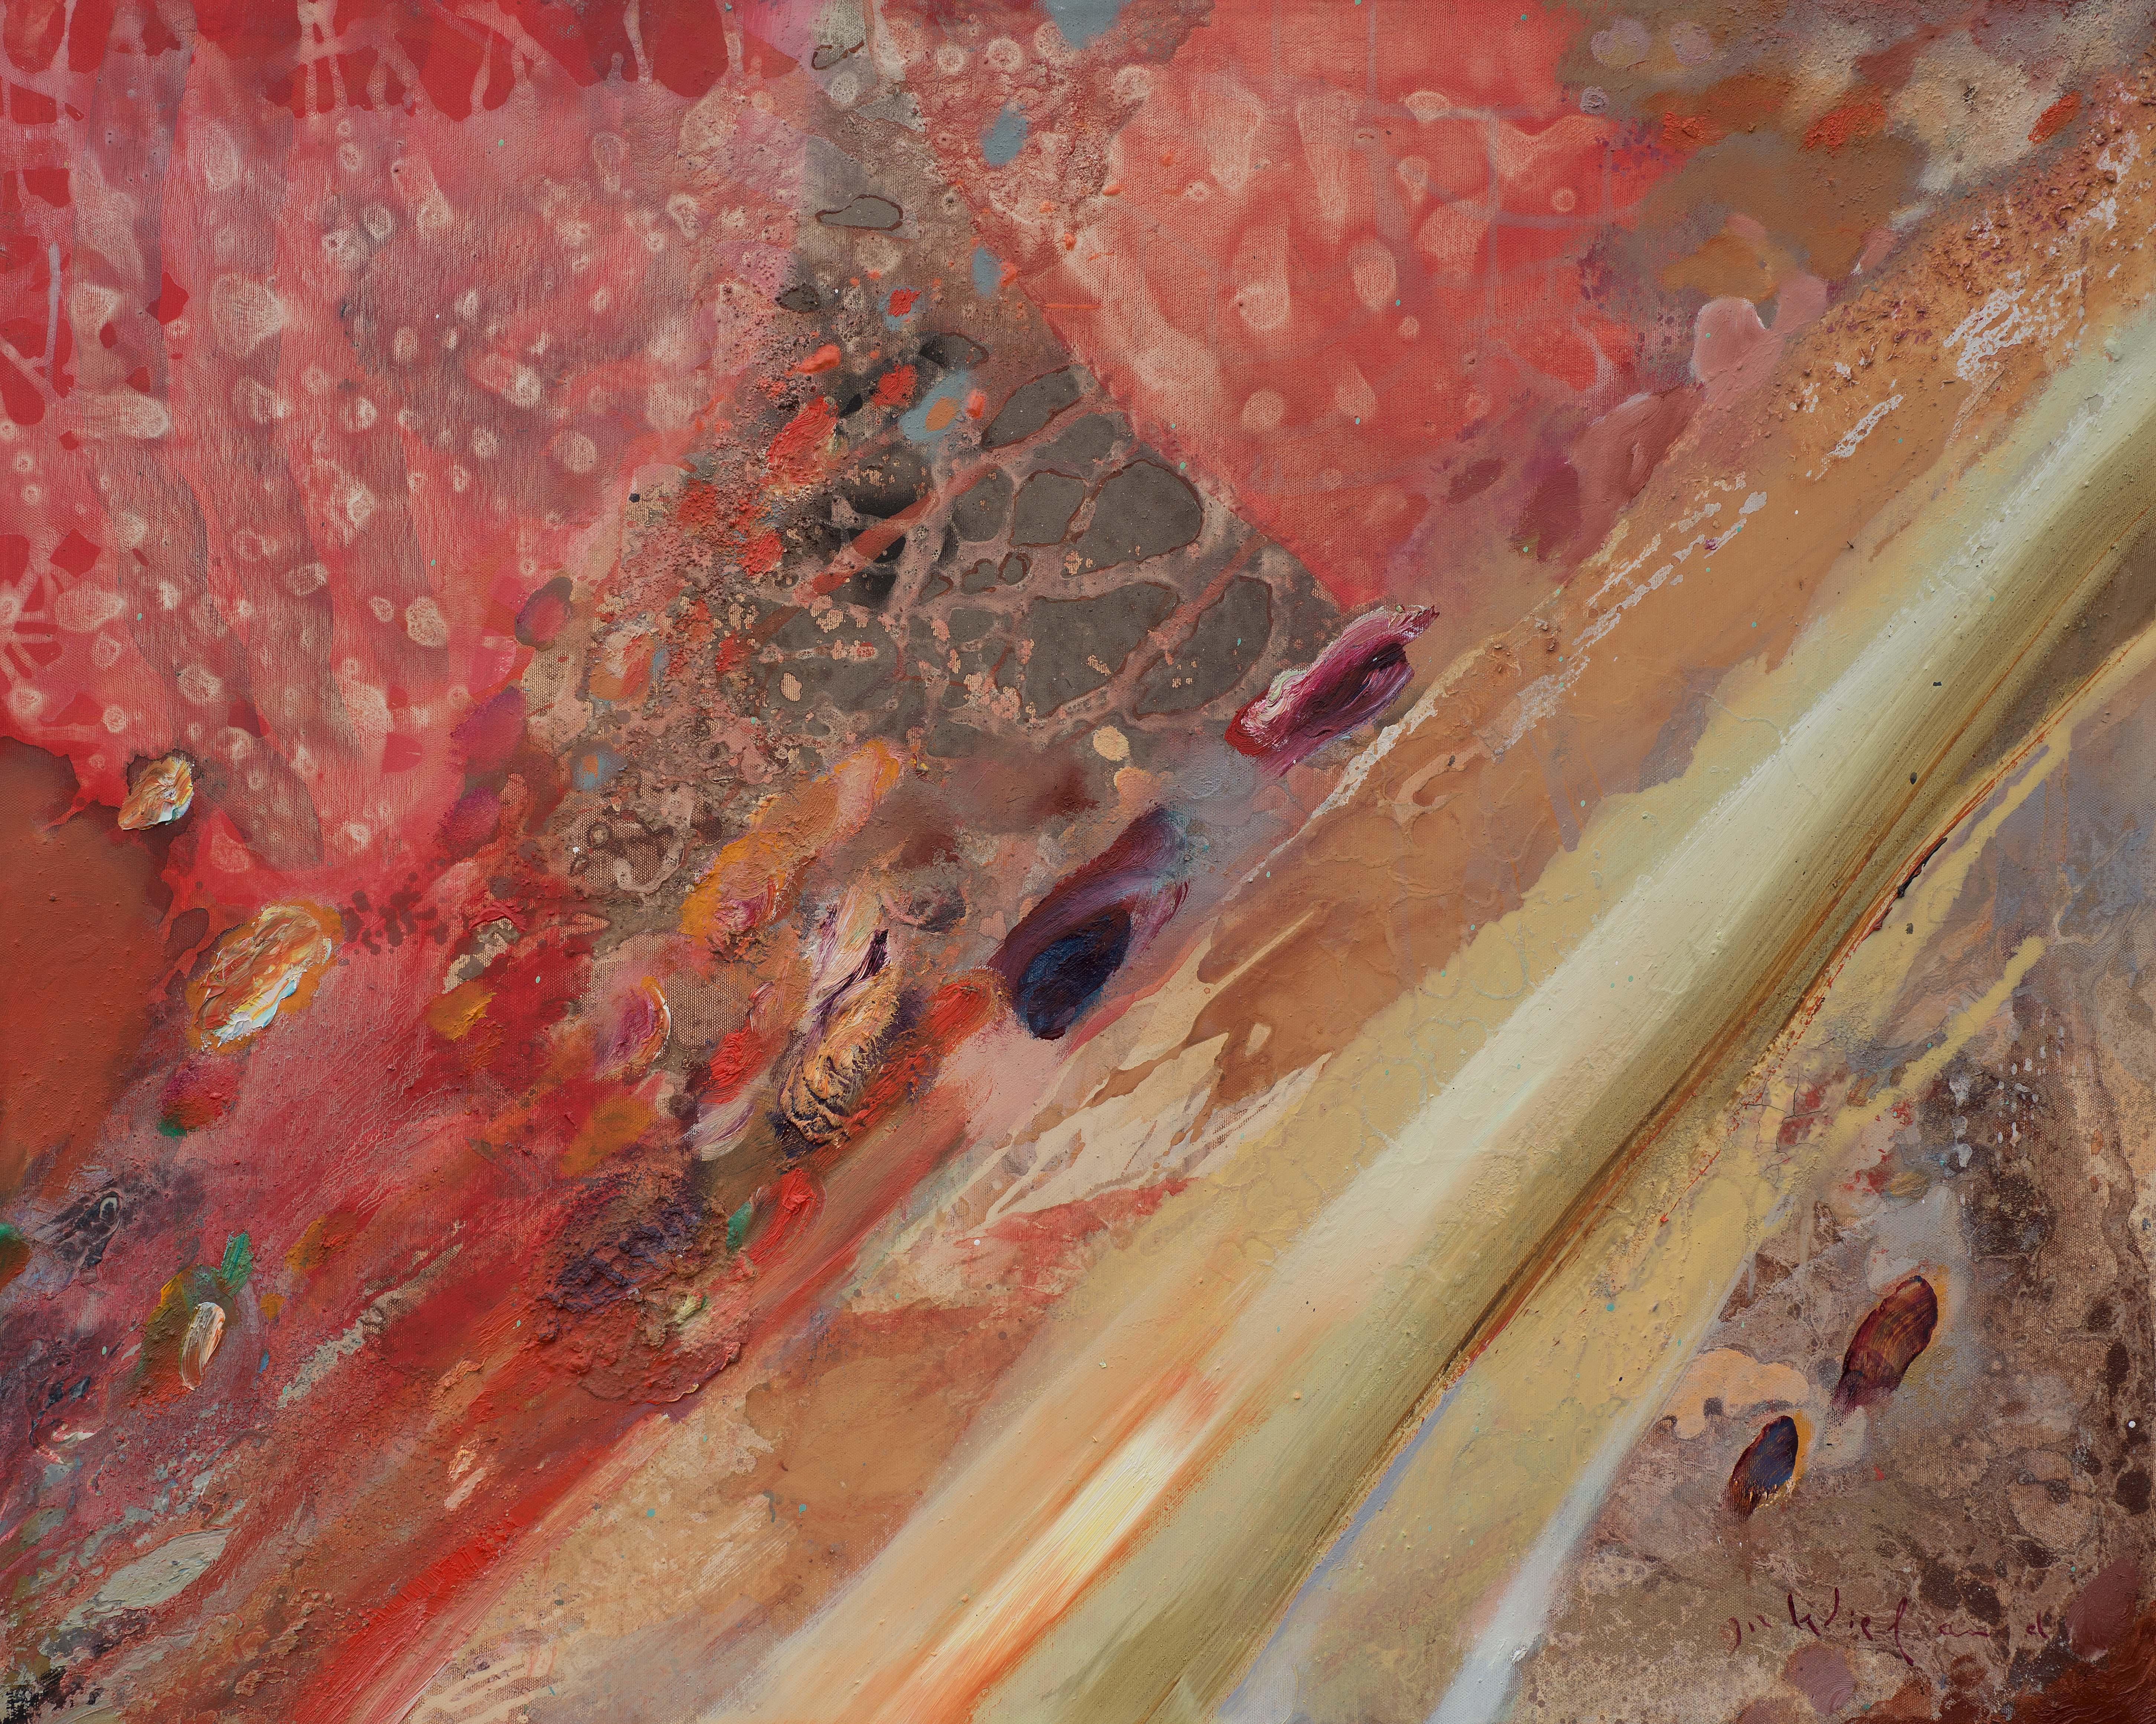 Wieland Richter - Faszination Lava